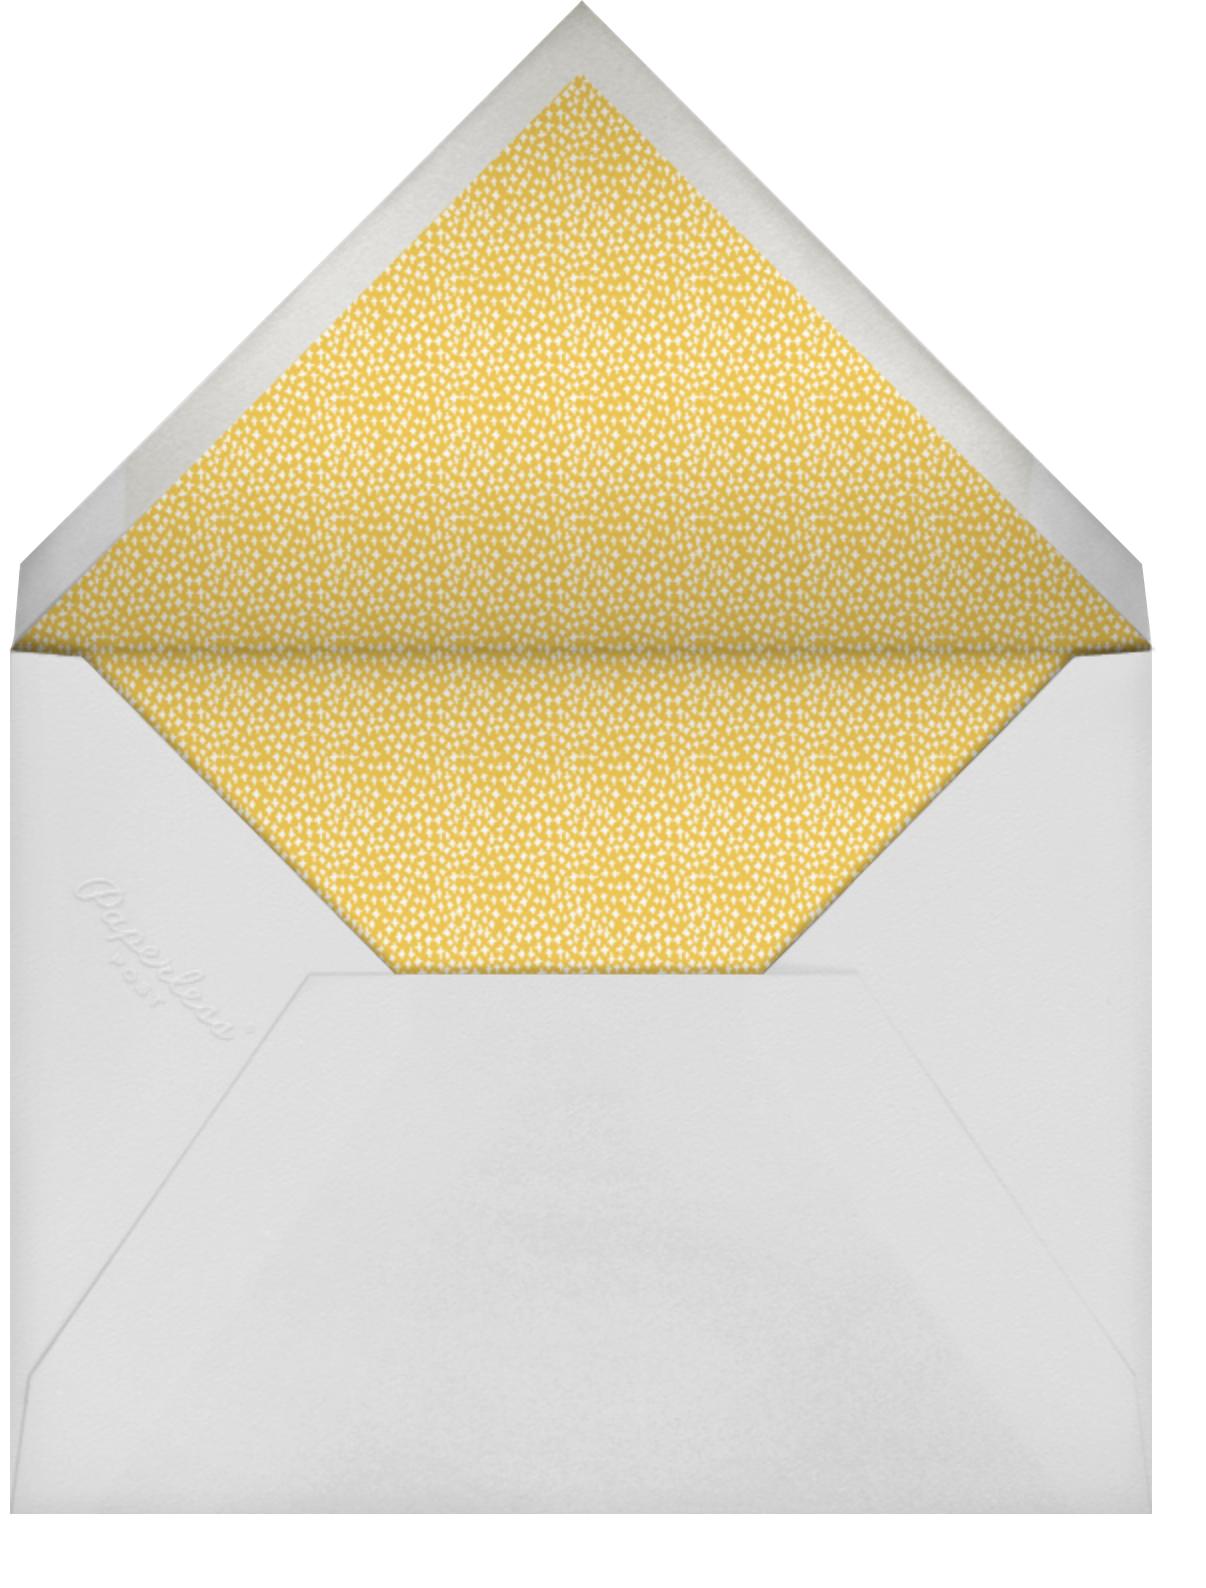 Grad Stacks - Mr. Boddington's Studio - Graduation - envelope back